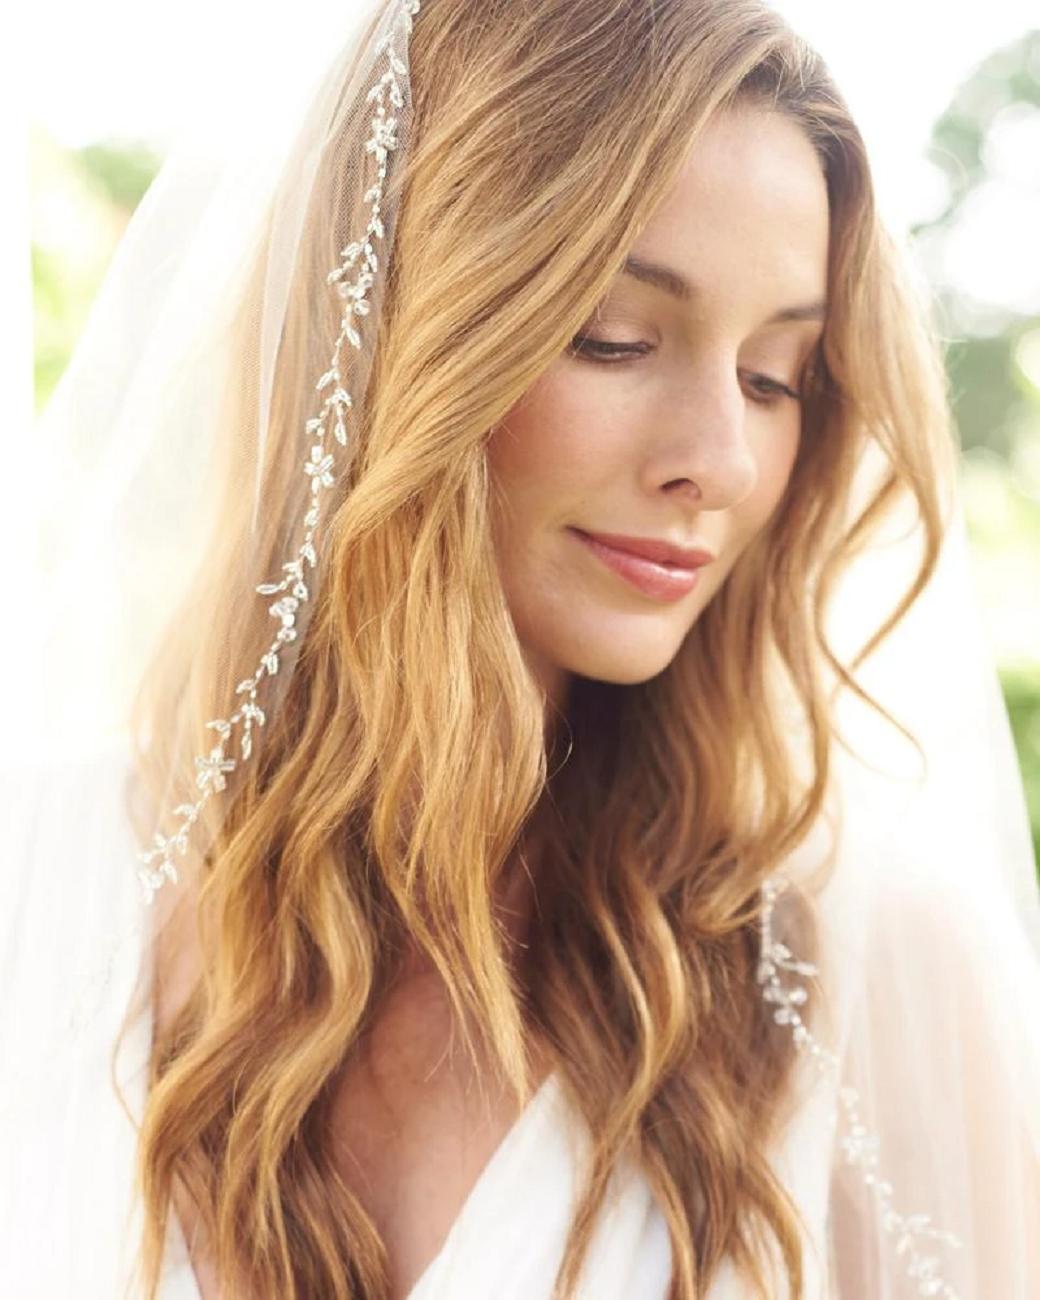 Bling wedding accessories  Layer Floral Vine & Leaf Edge Rhinestones Veil